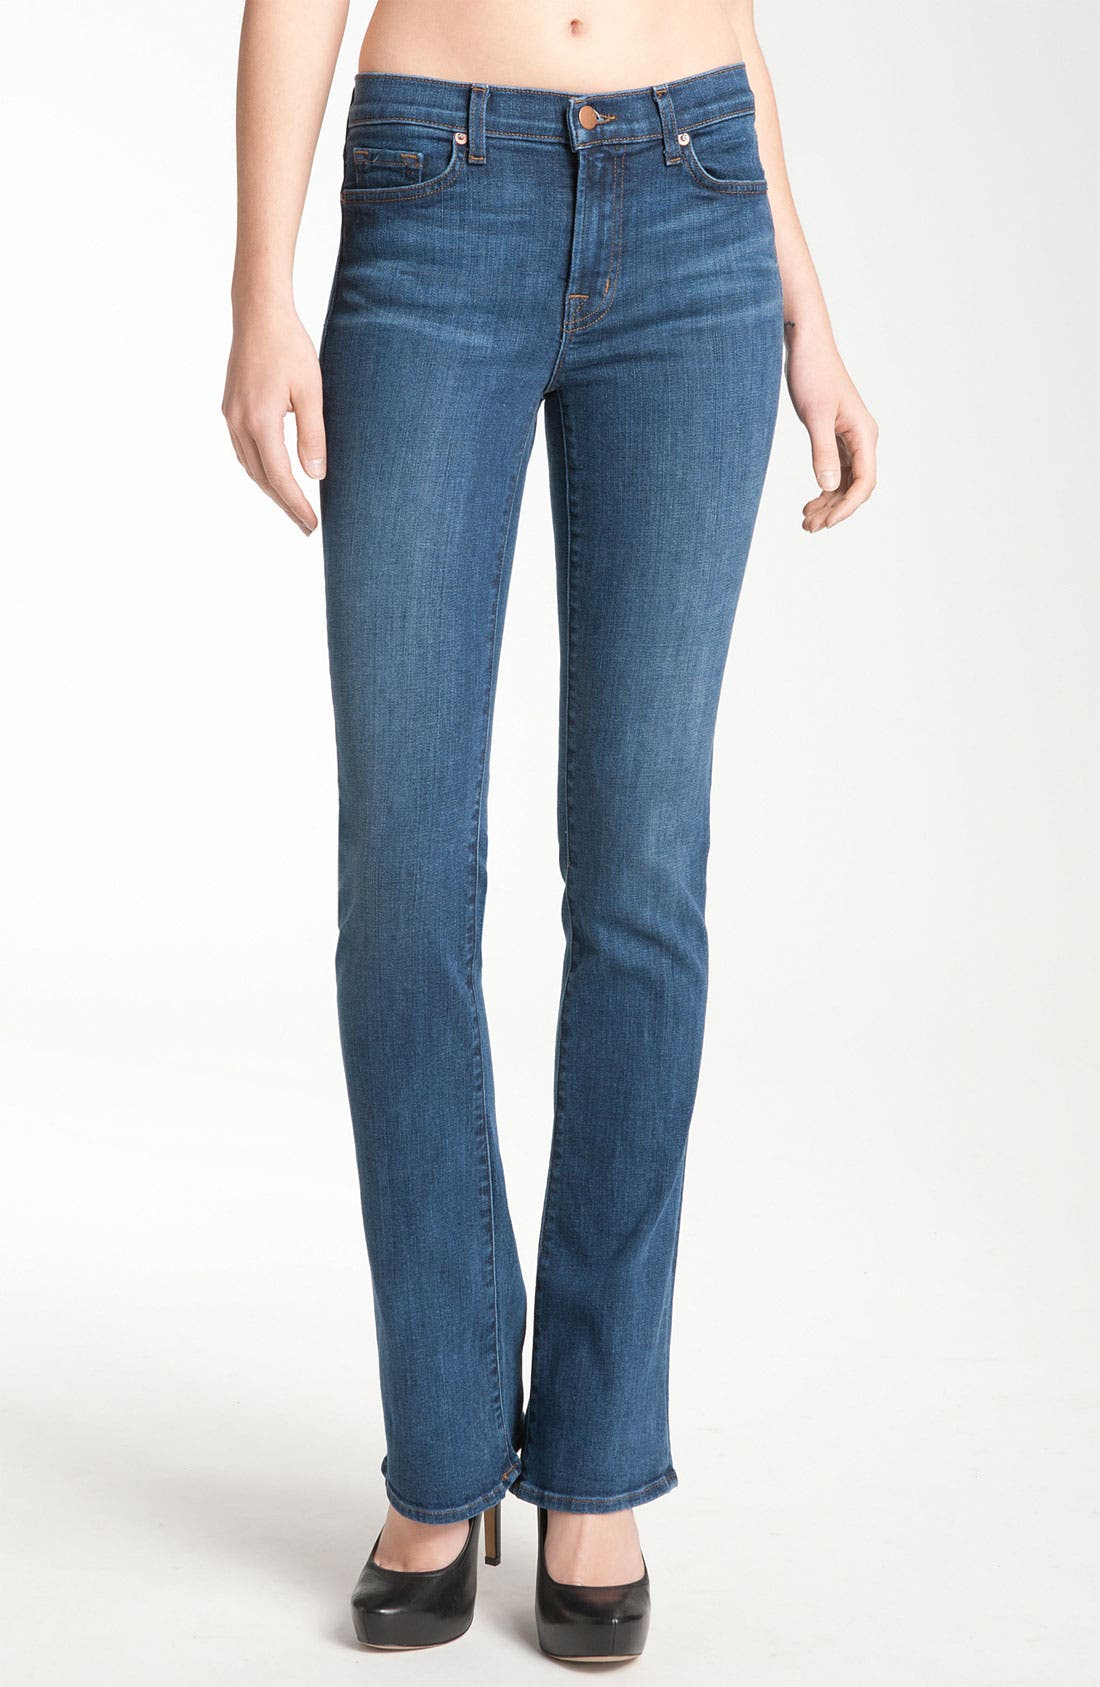 Main Image - J Brand 'Janey' Super Slim Bootcut Jeans (Bluebell Wash)